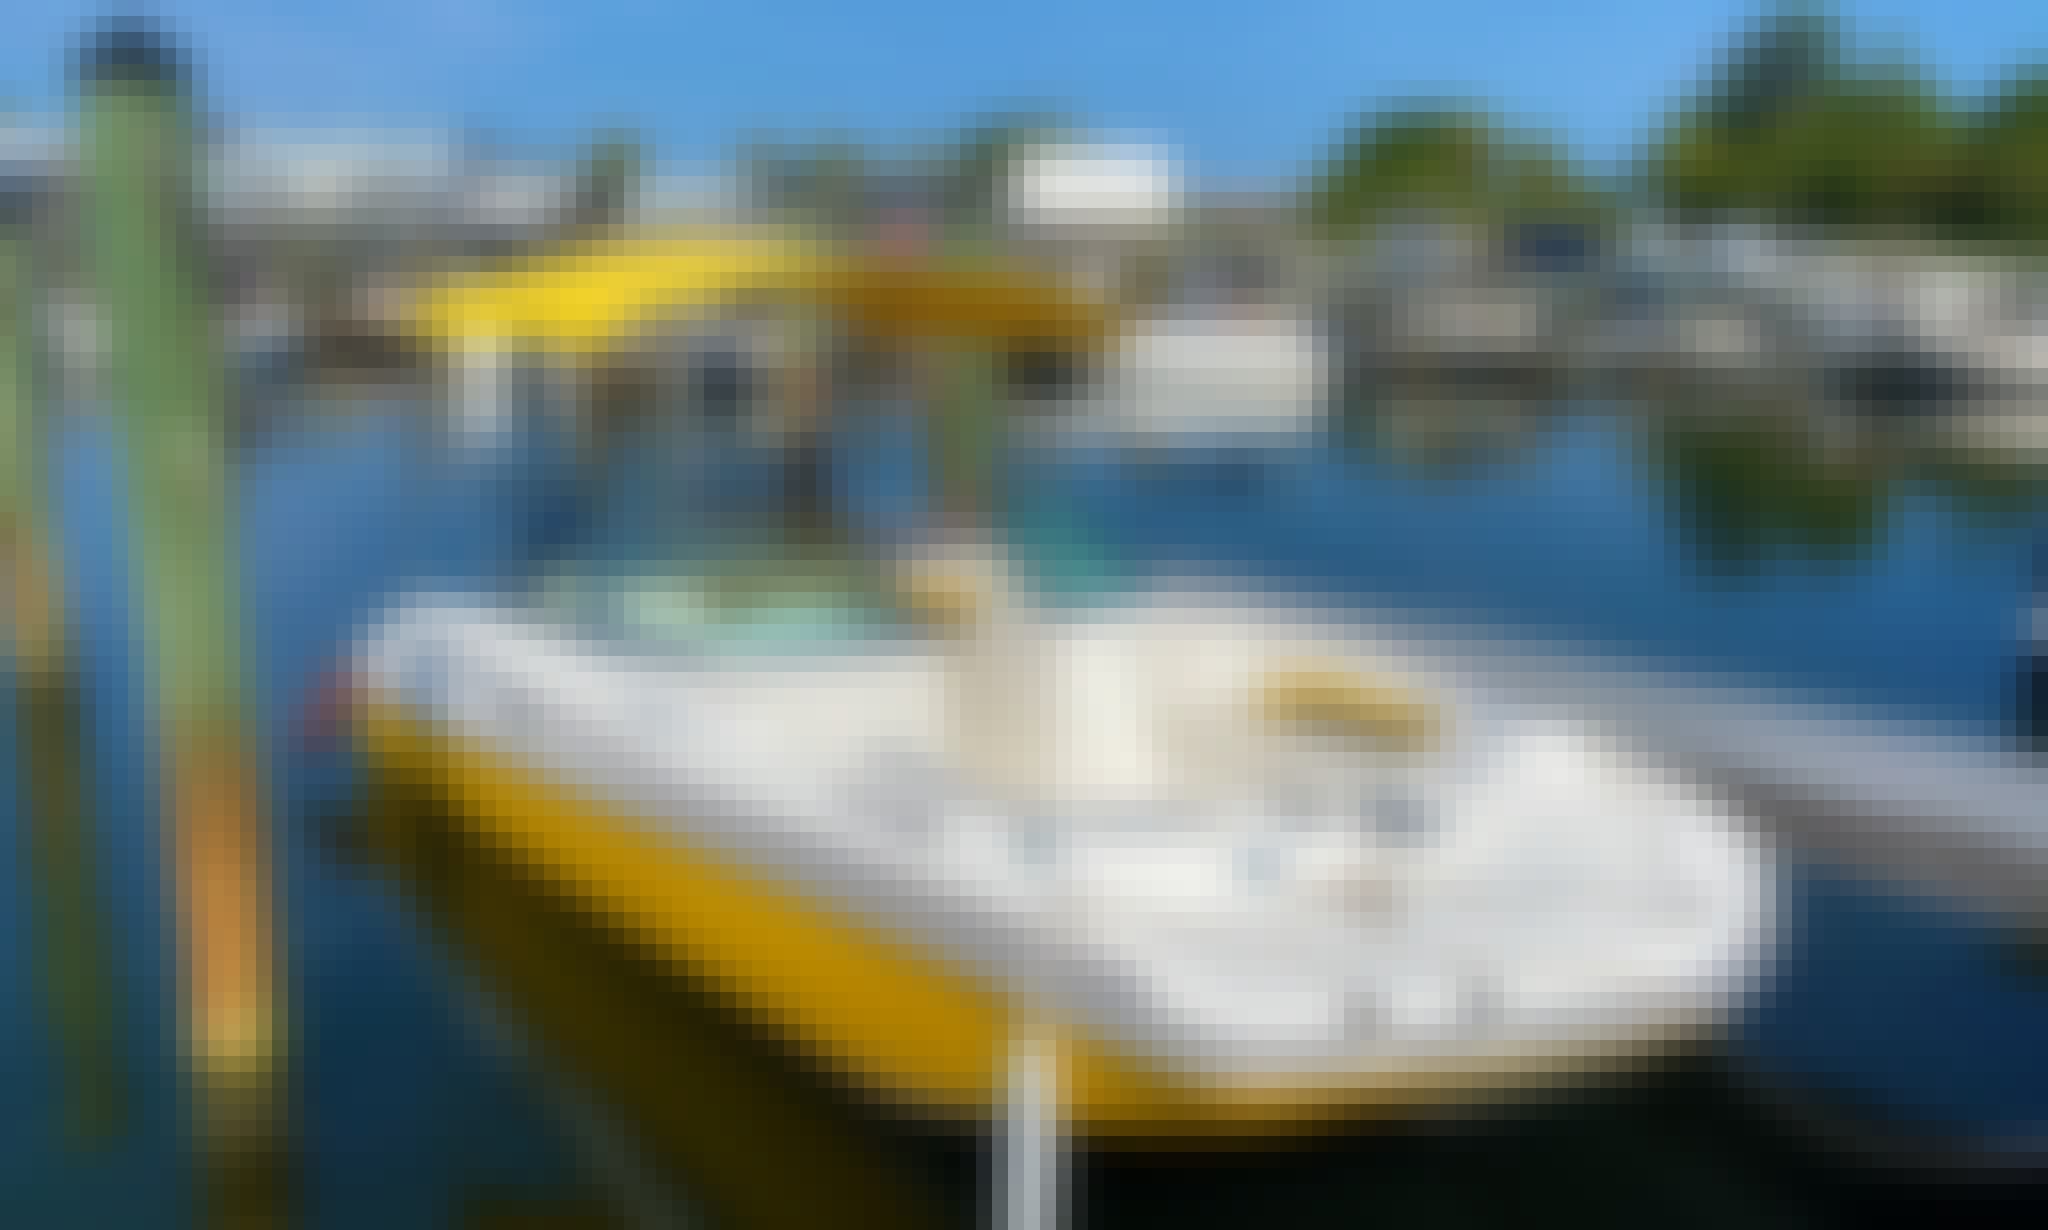 Hurricane Sun Deck 187 - SWFL Boat Rental